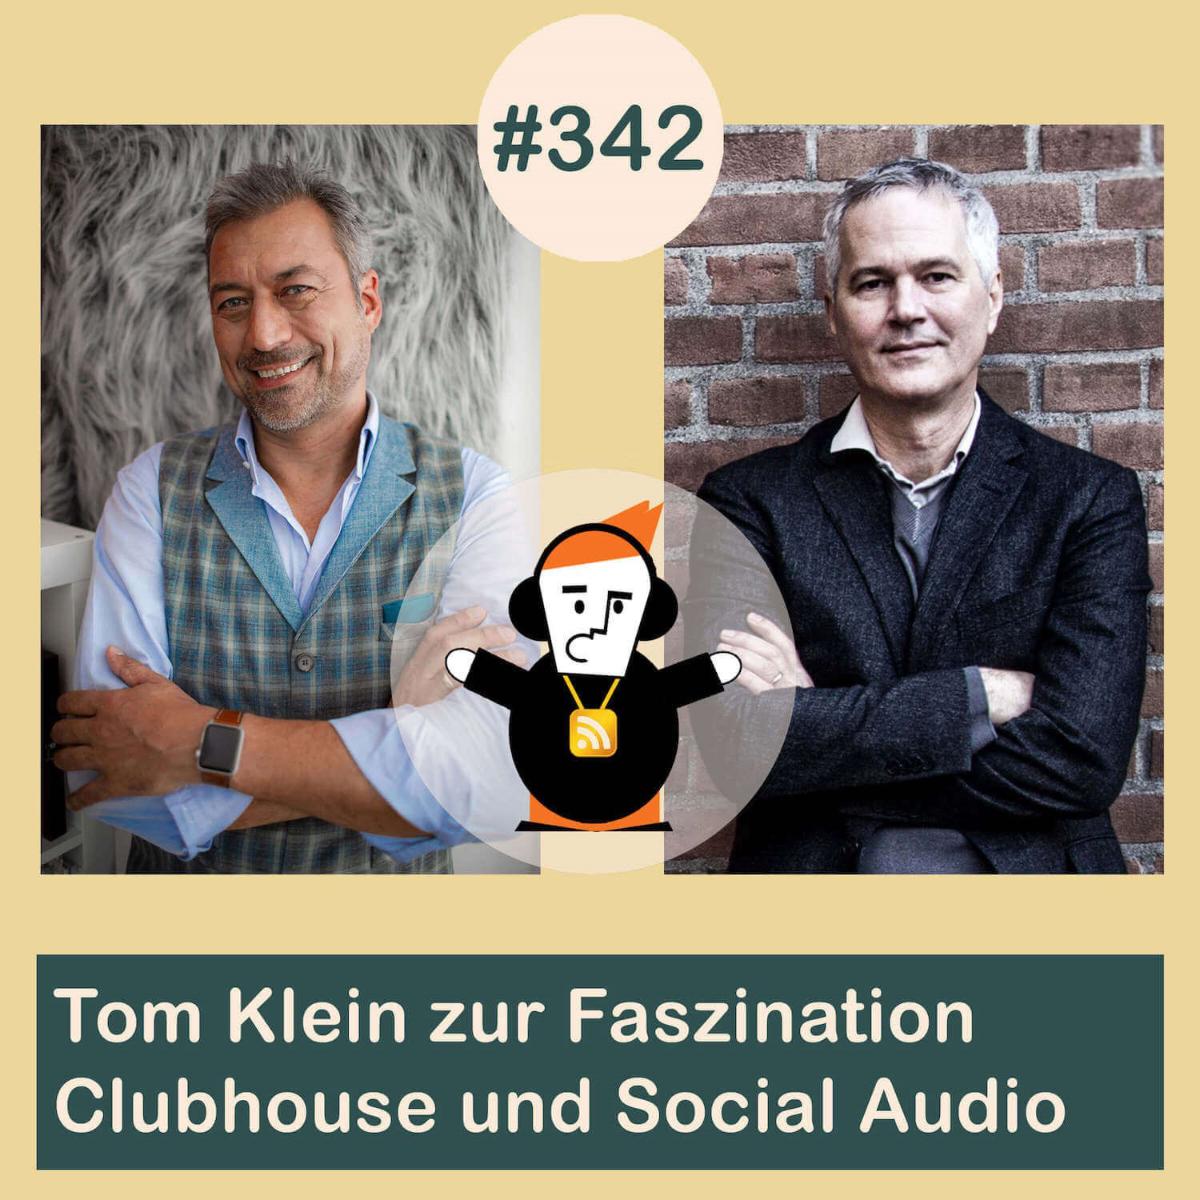 Tom Klein | Podcast | Faszination Clubhouse und Social Audio